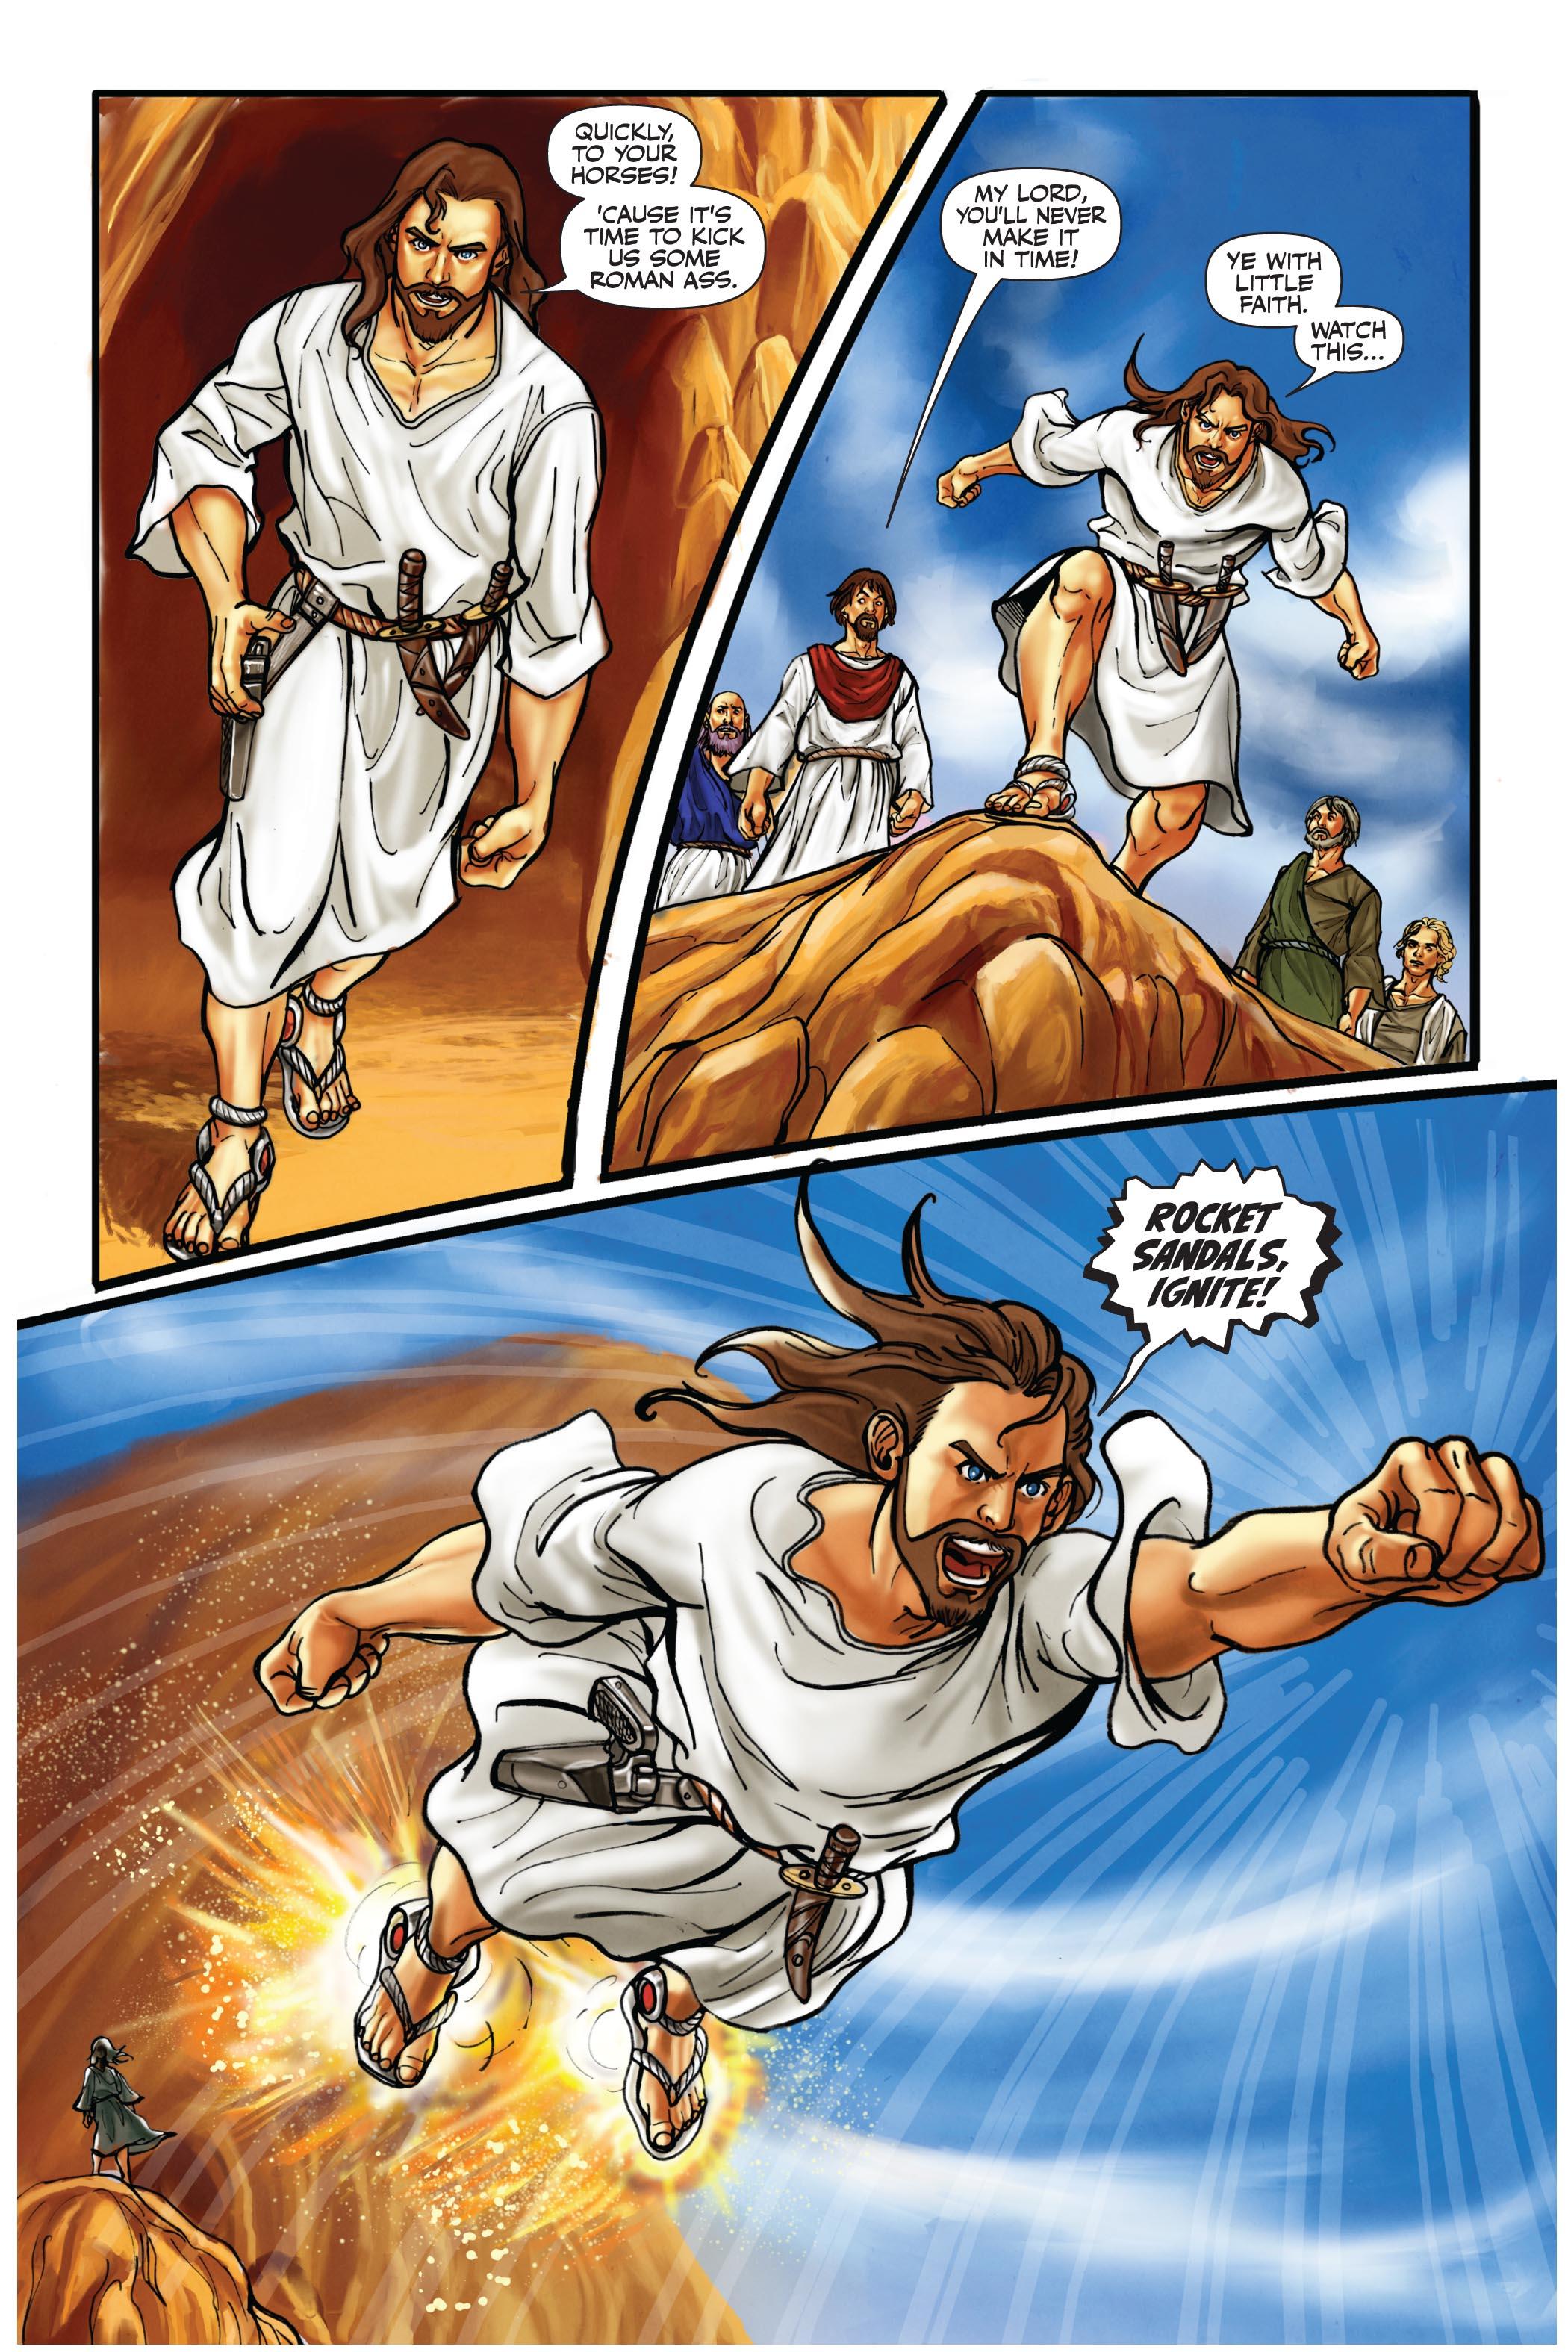 Christian Comic Books - Christianbook.com